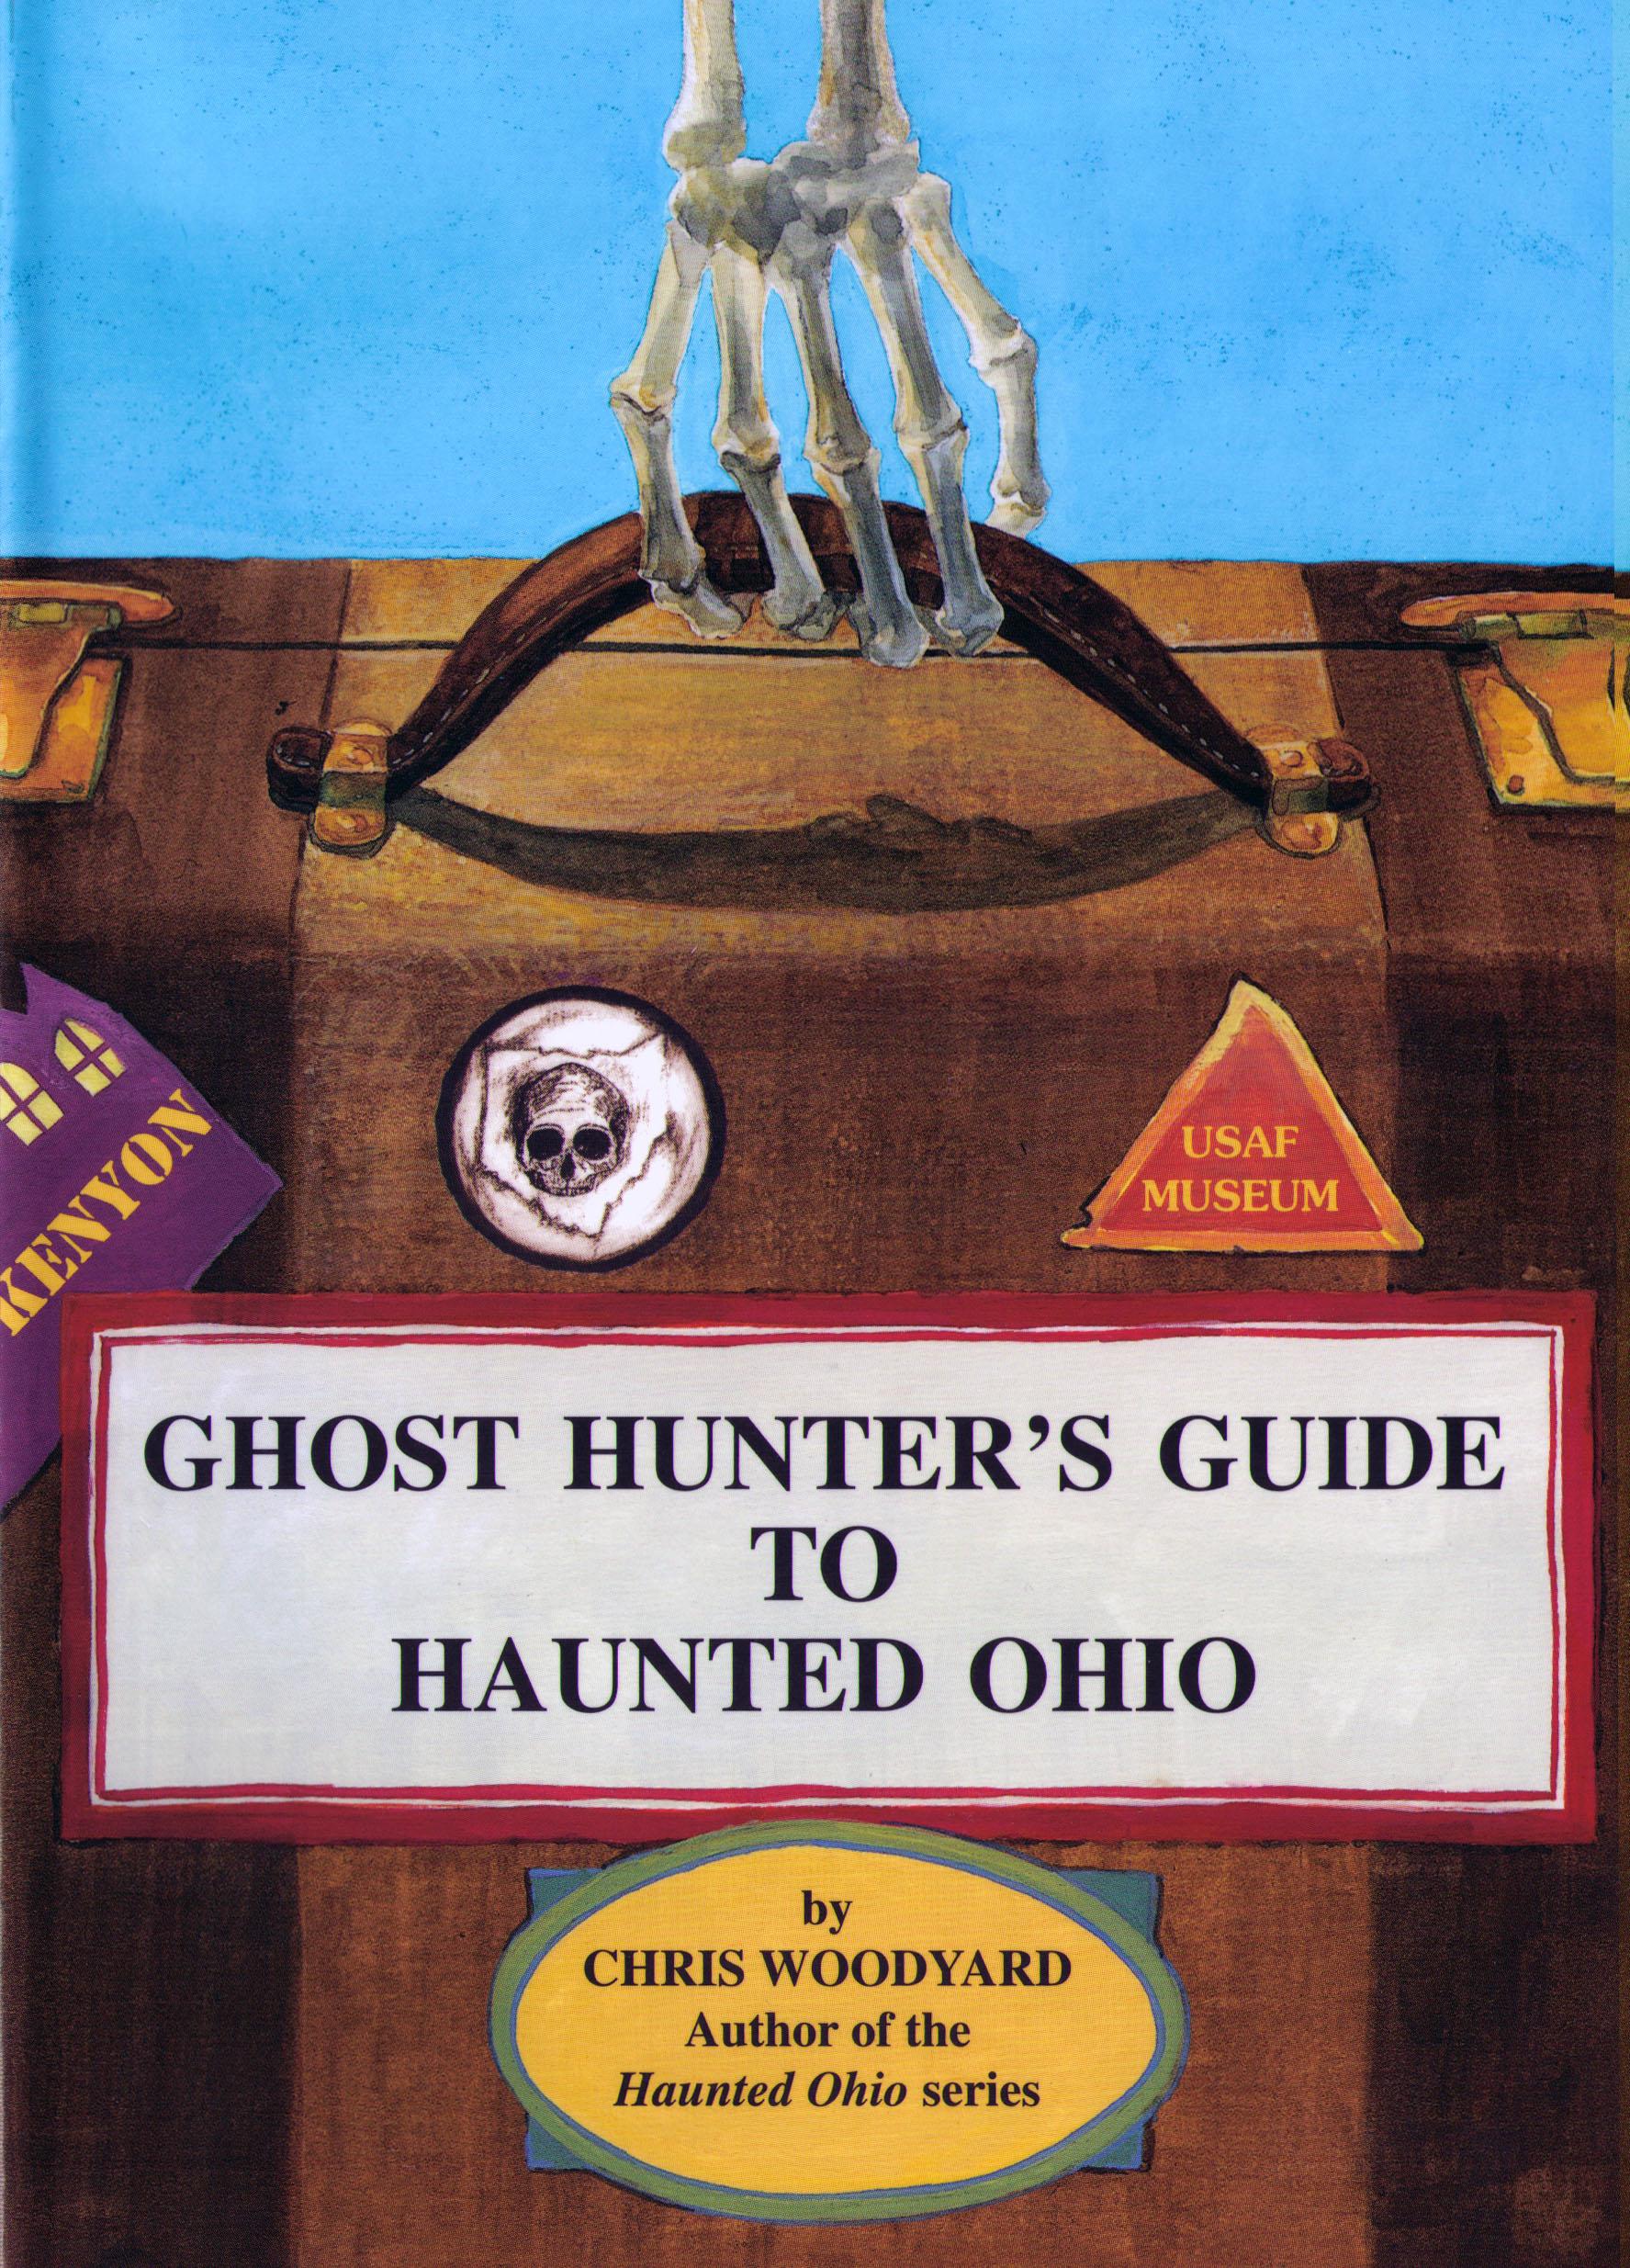 Ghost Hunter's Guide to Haunted Ohio - Haunted Ohio Books